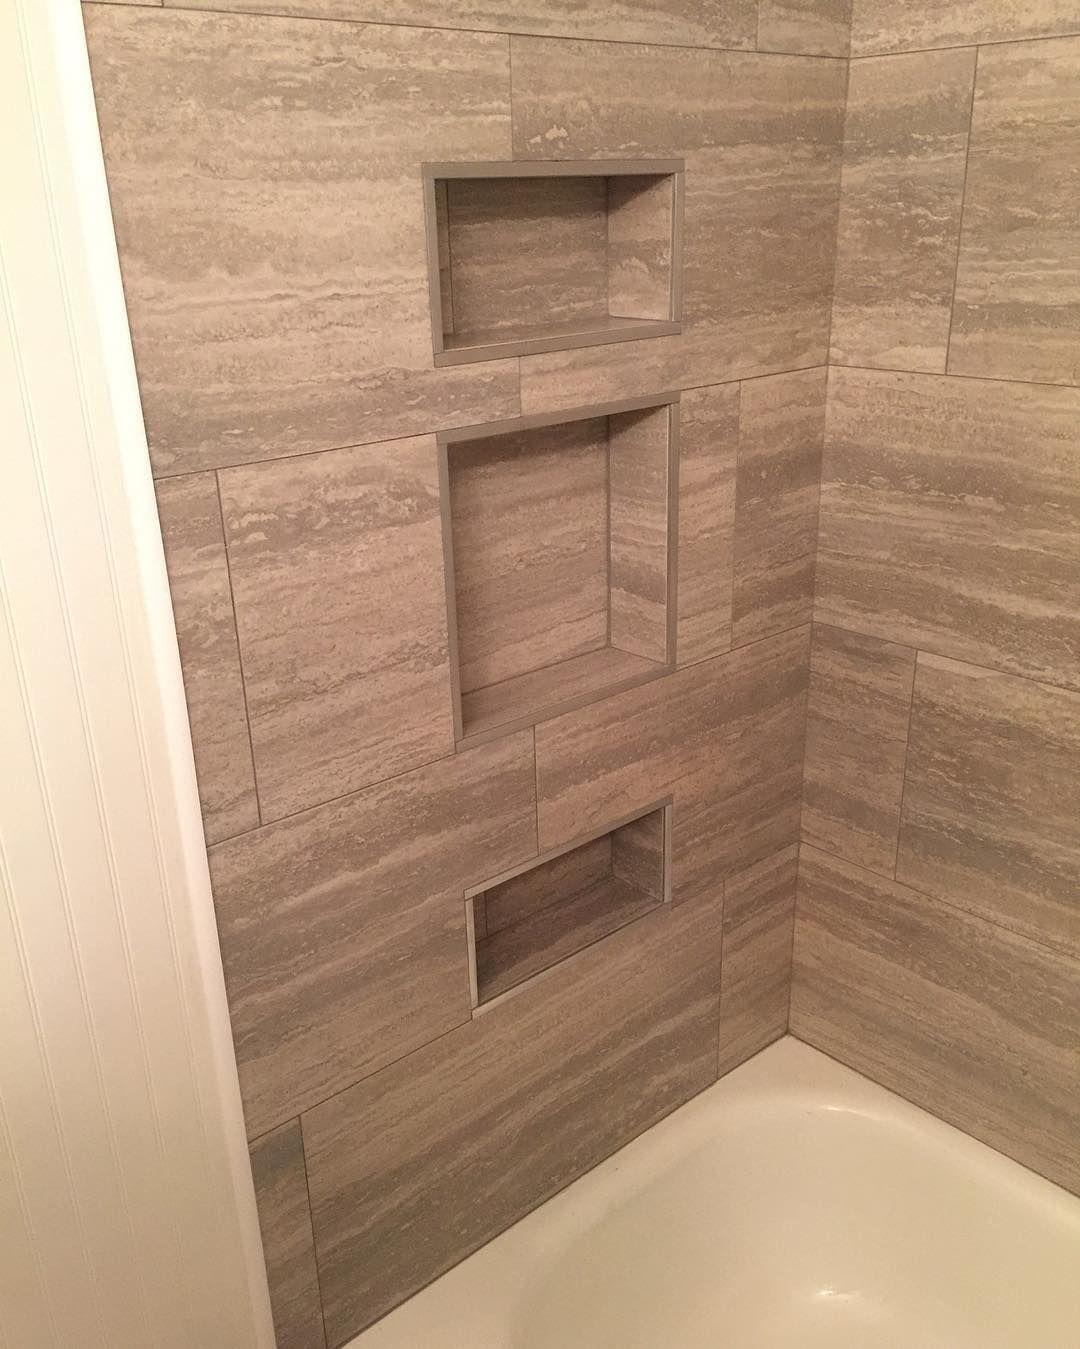 Marcus On Instagram: Built In Shower Caddy #schluter #bathroomremodel #tile  #restore